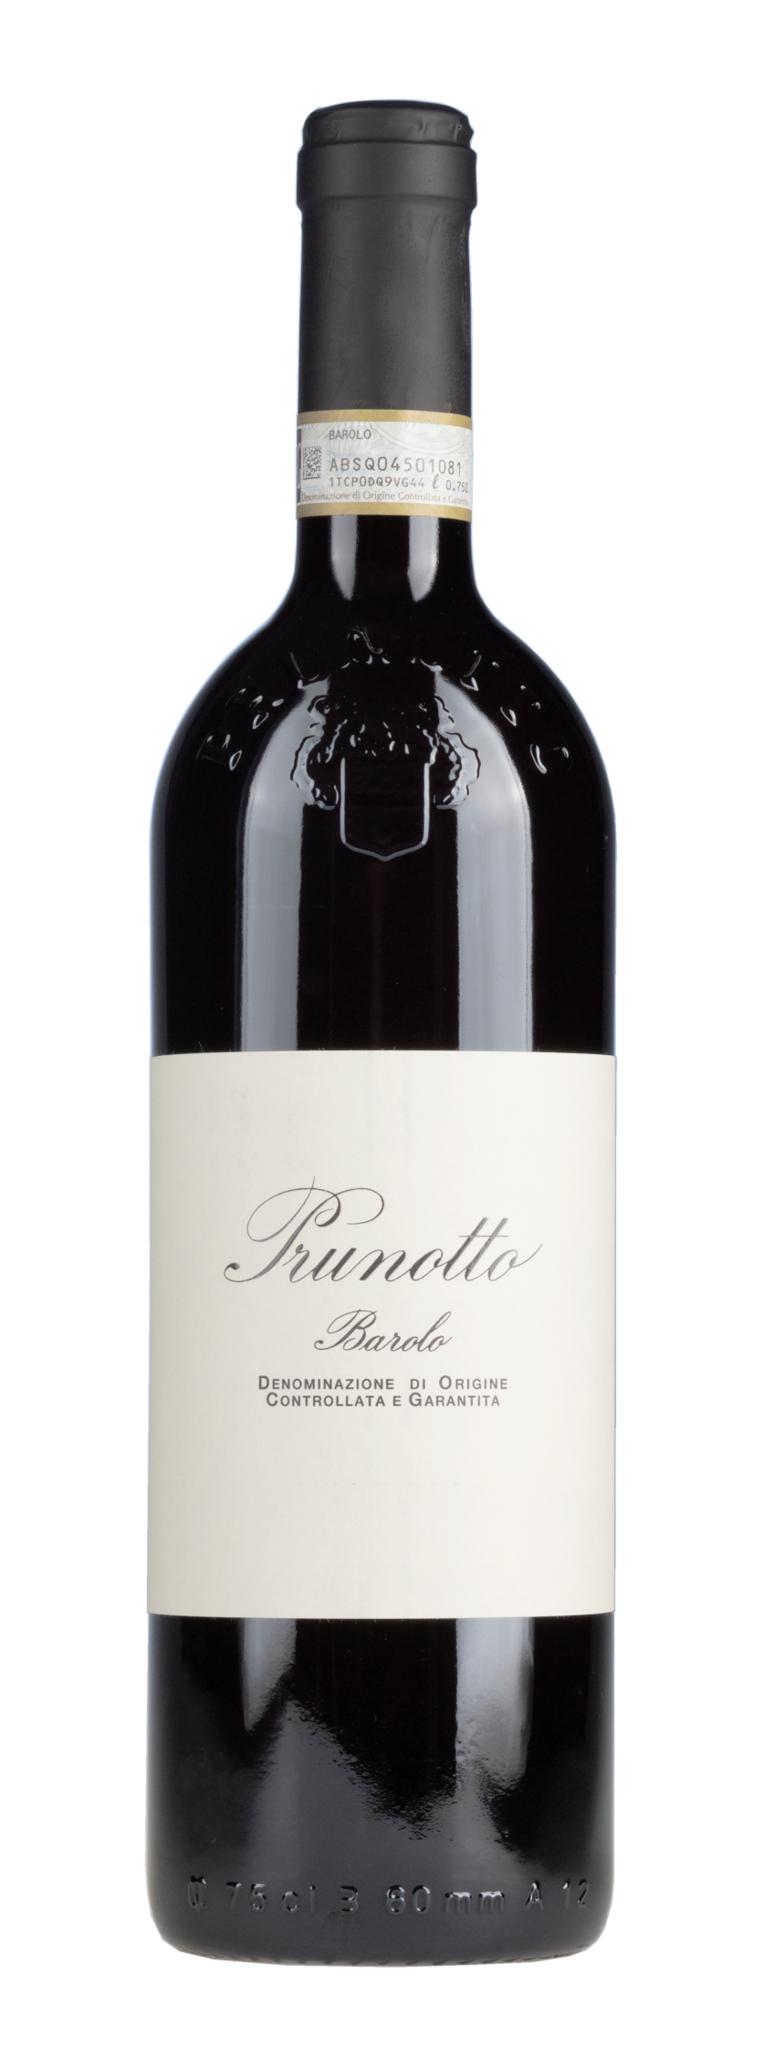 Prunotto - Piemont 2016 Barolo DOCG, Prunotto